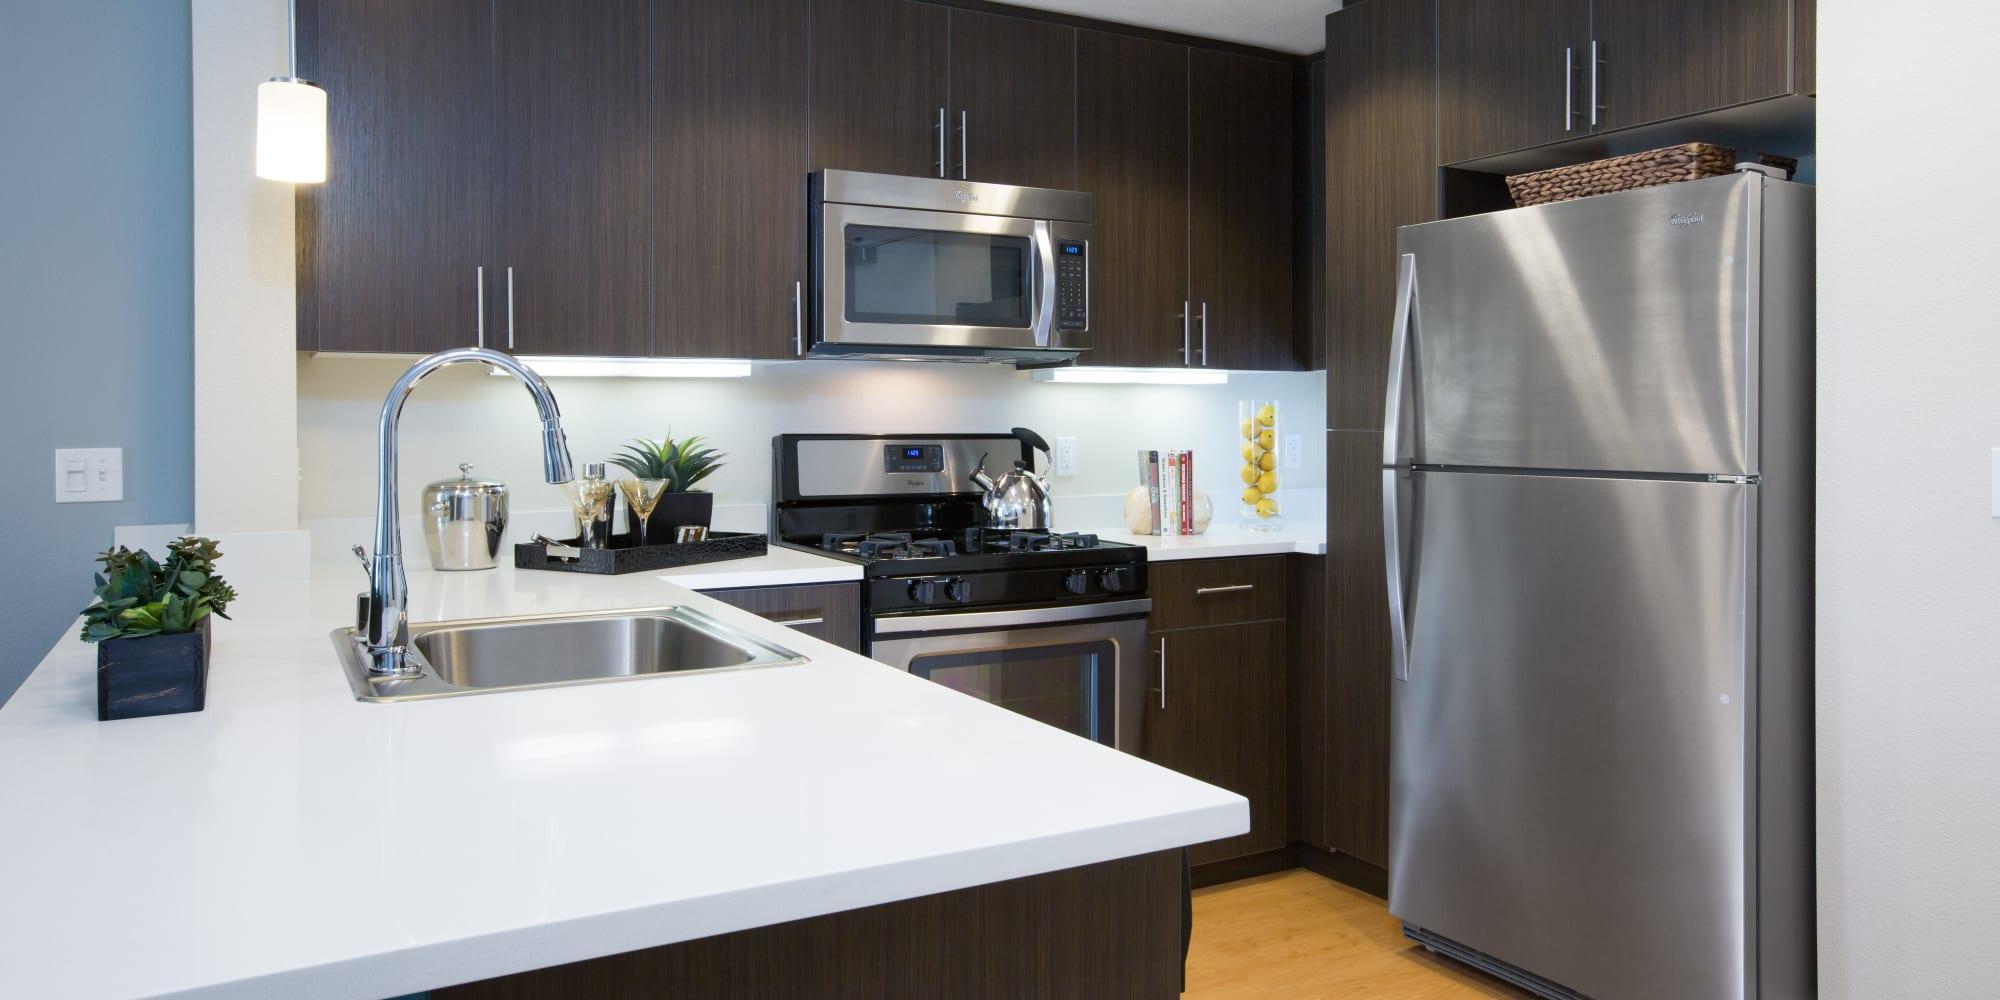 Apartments at Sofi Riverview Park in San Jose, California